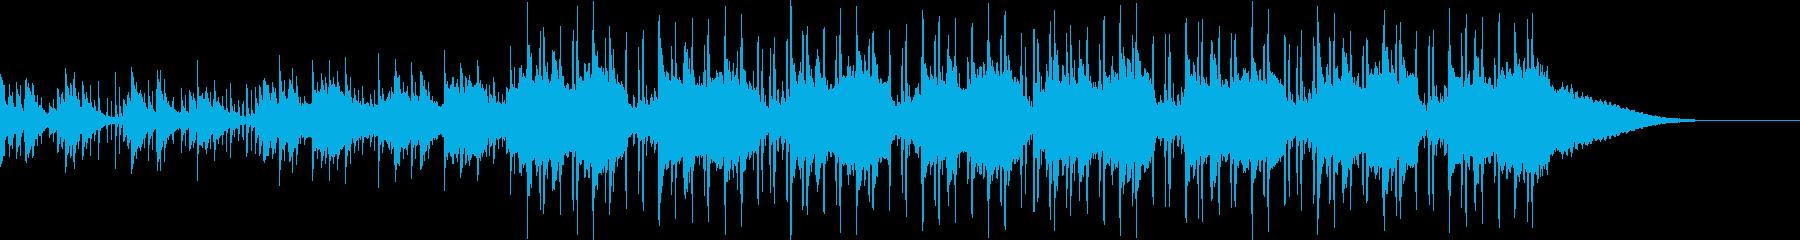 Pf「入眠」和風現代ジャズの再生済みの波形